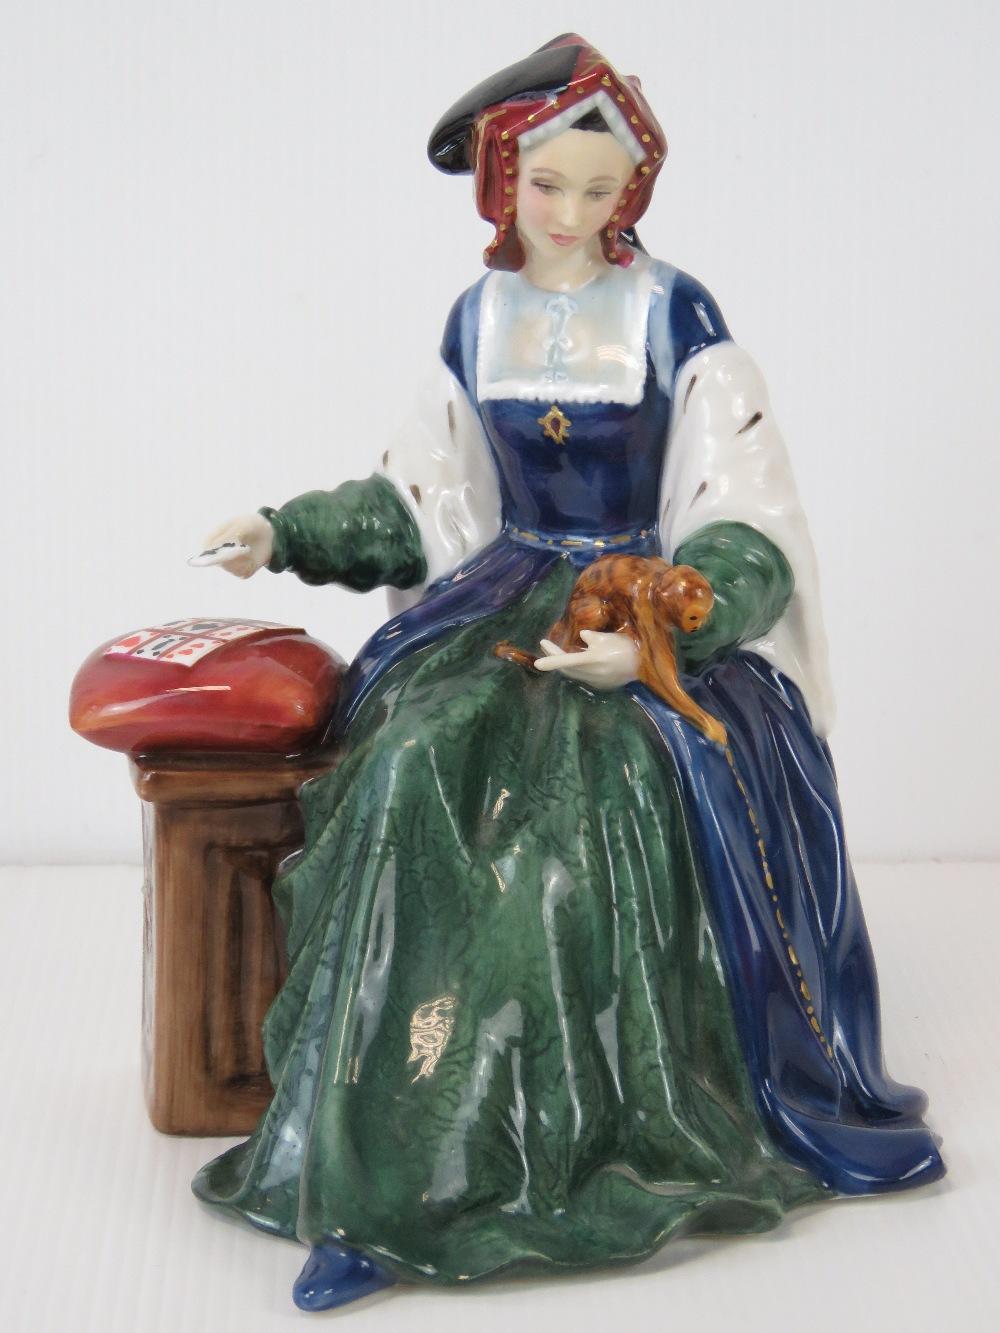 A limited edition Royal Doulton figure o